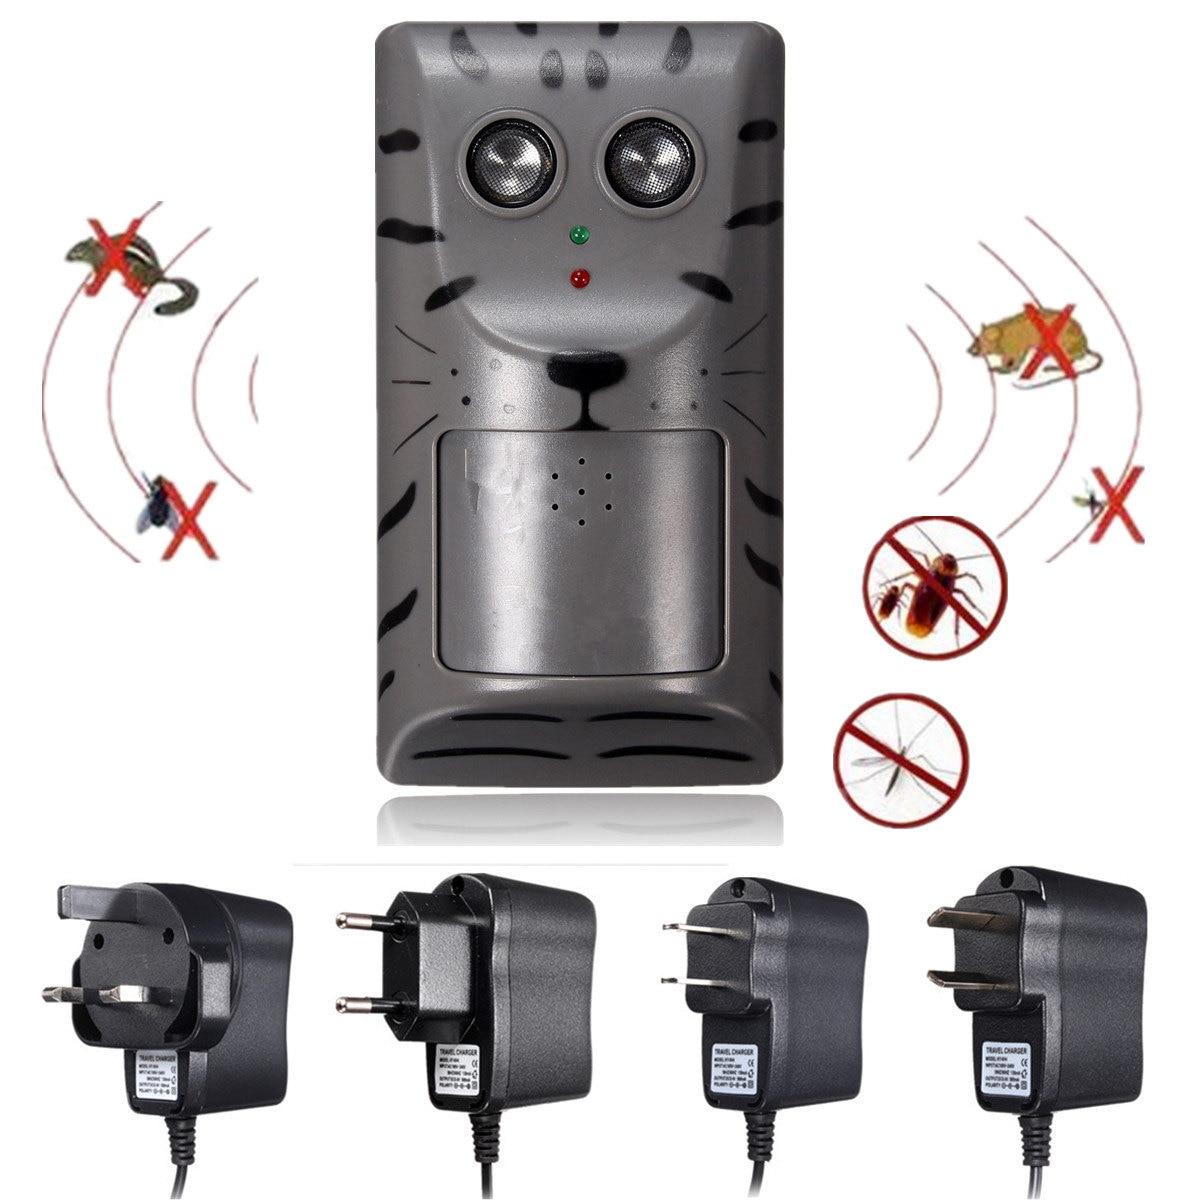 Us Uk Eu Au Plug 2018 Summer Supply Electronic Ultrasonic